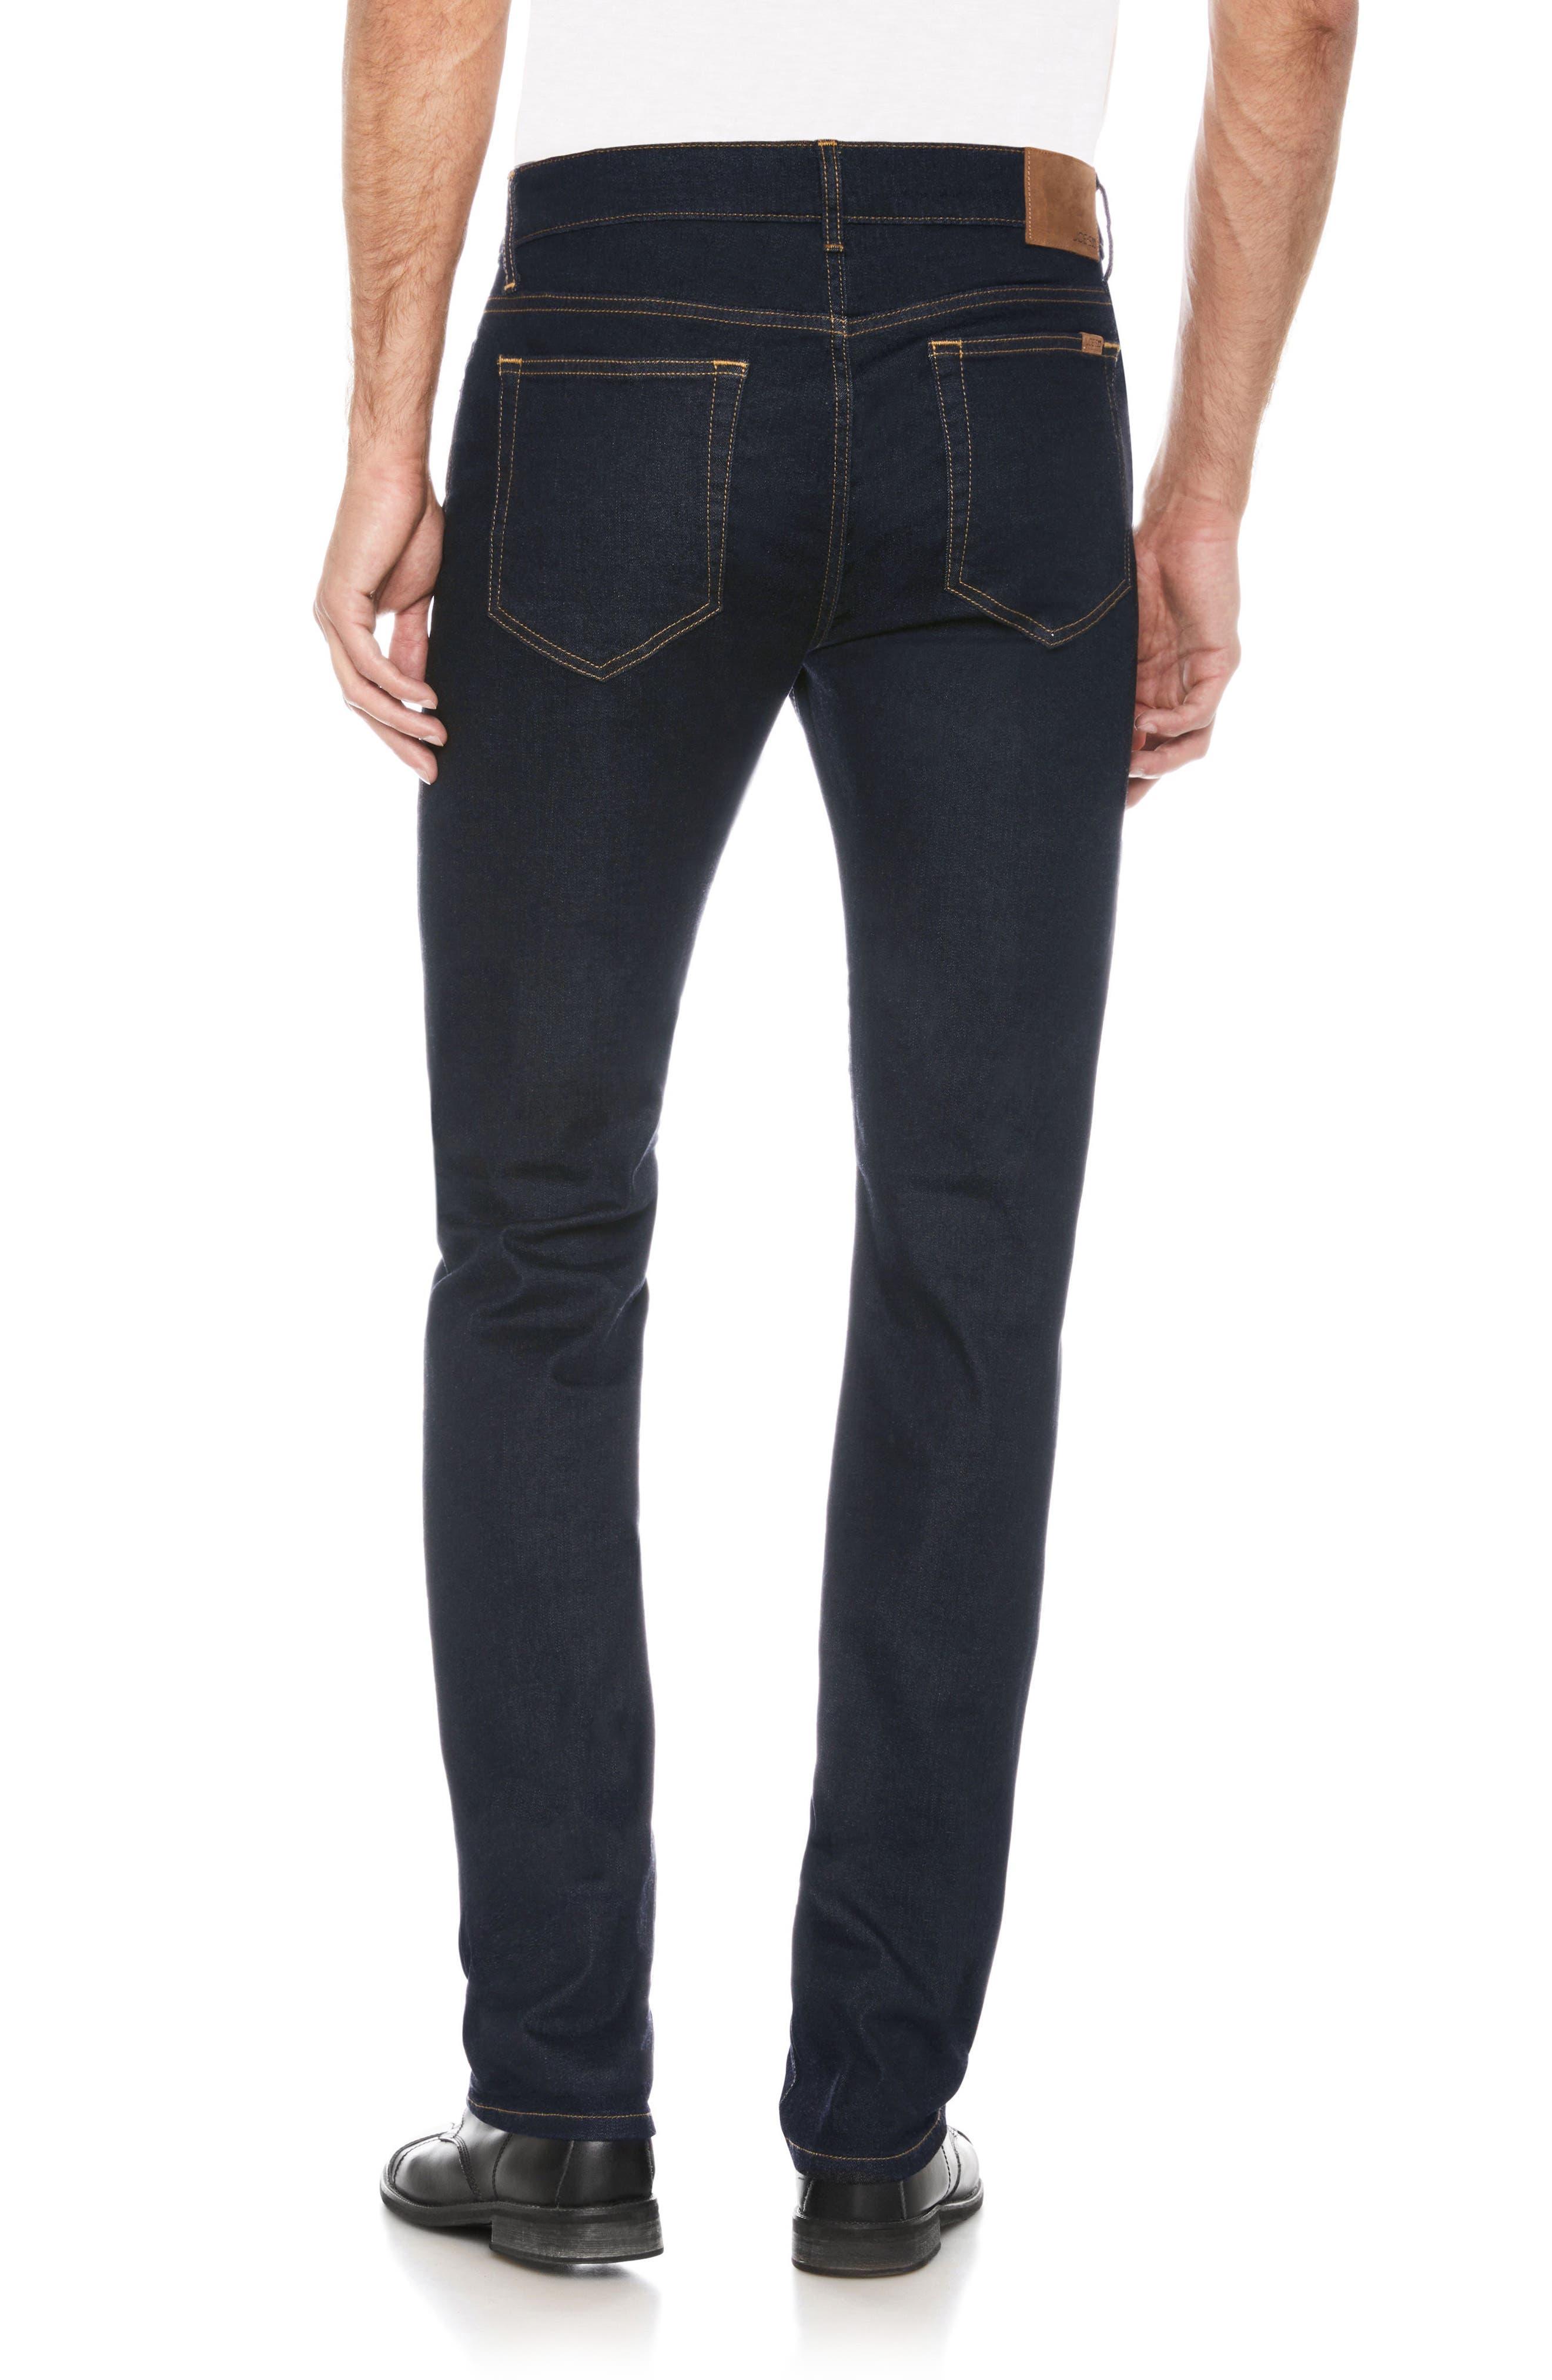 Brixton Slim Straight Fit Jeans,                             Alternate thumbnail 2, color,                             400